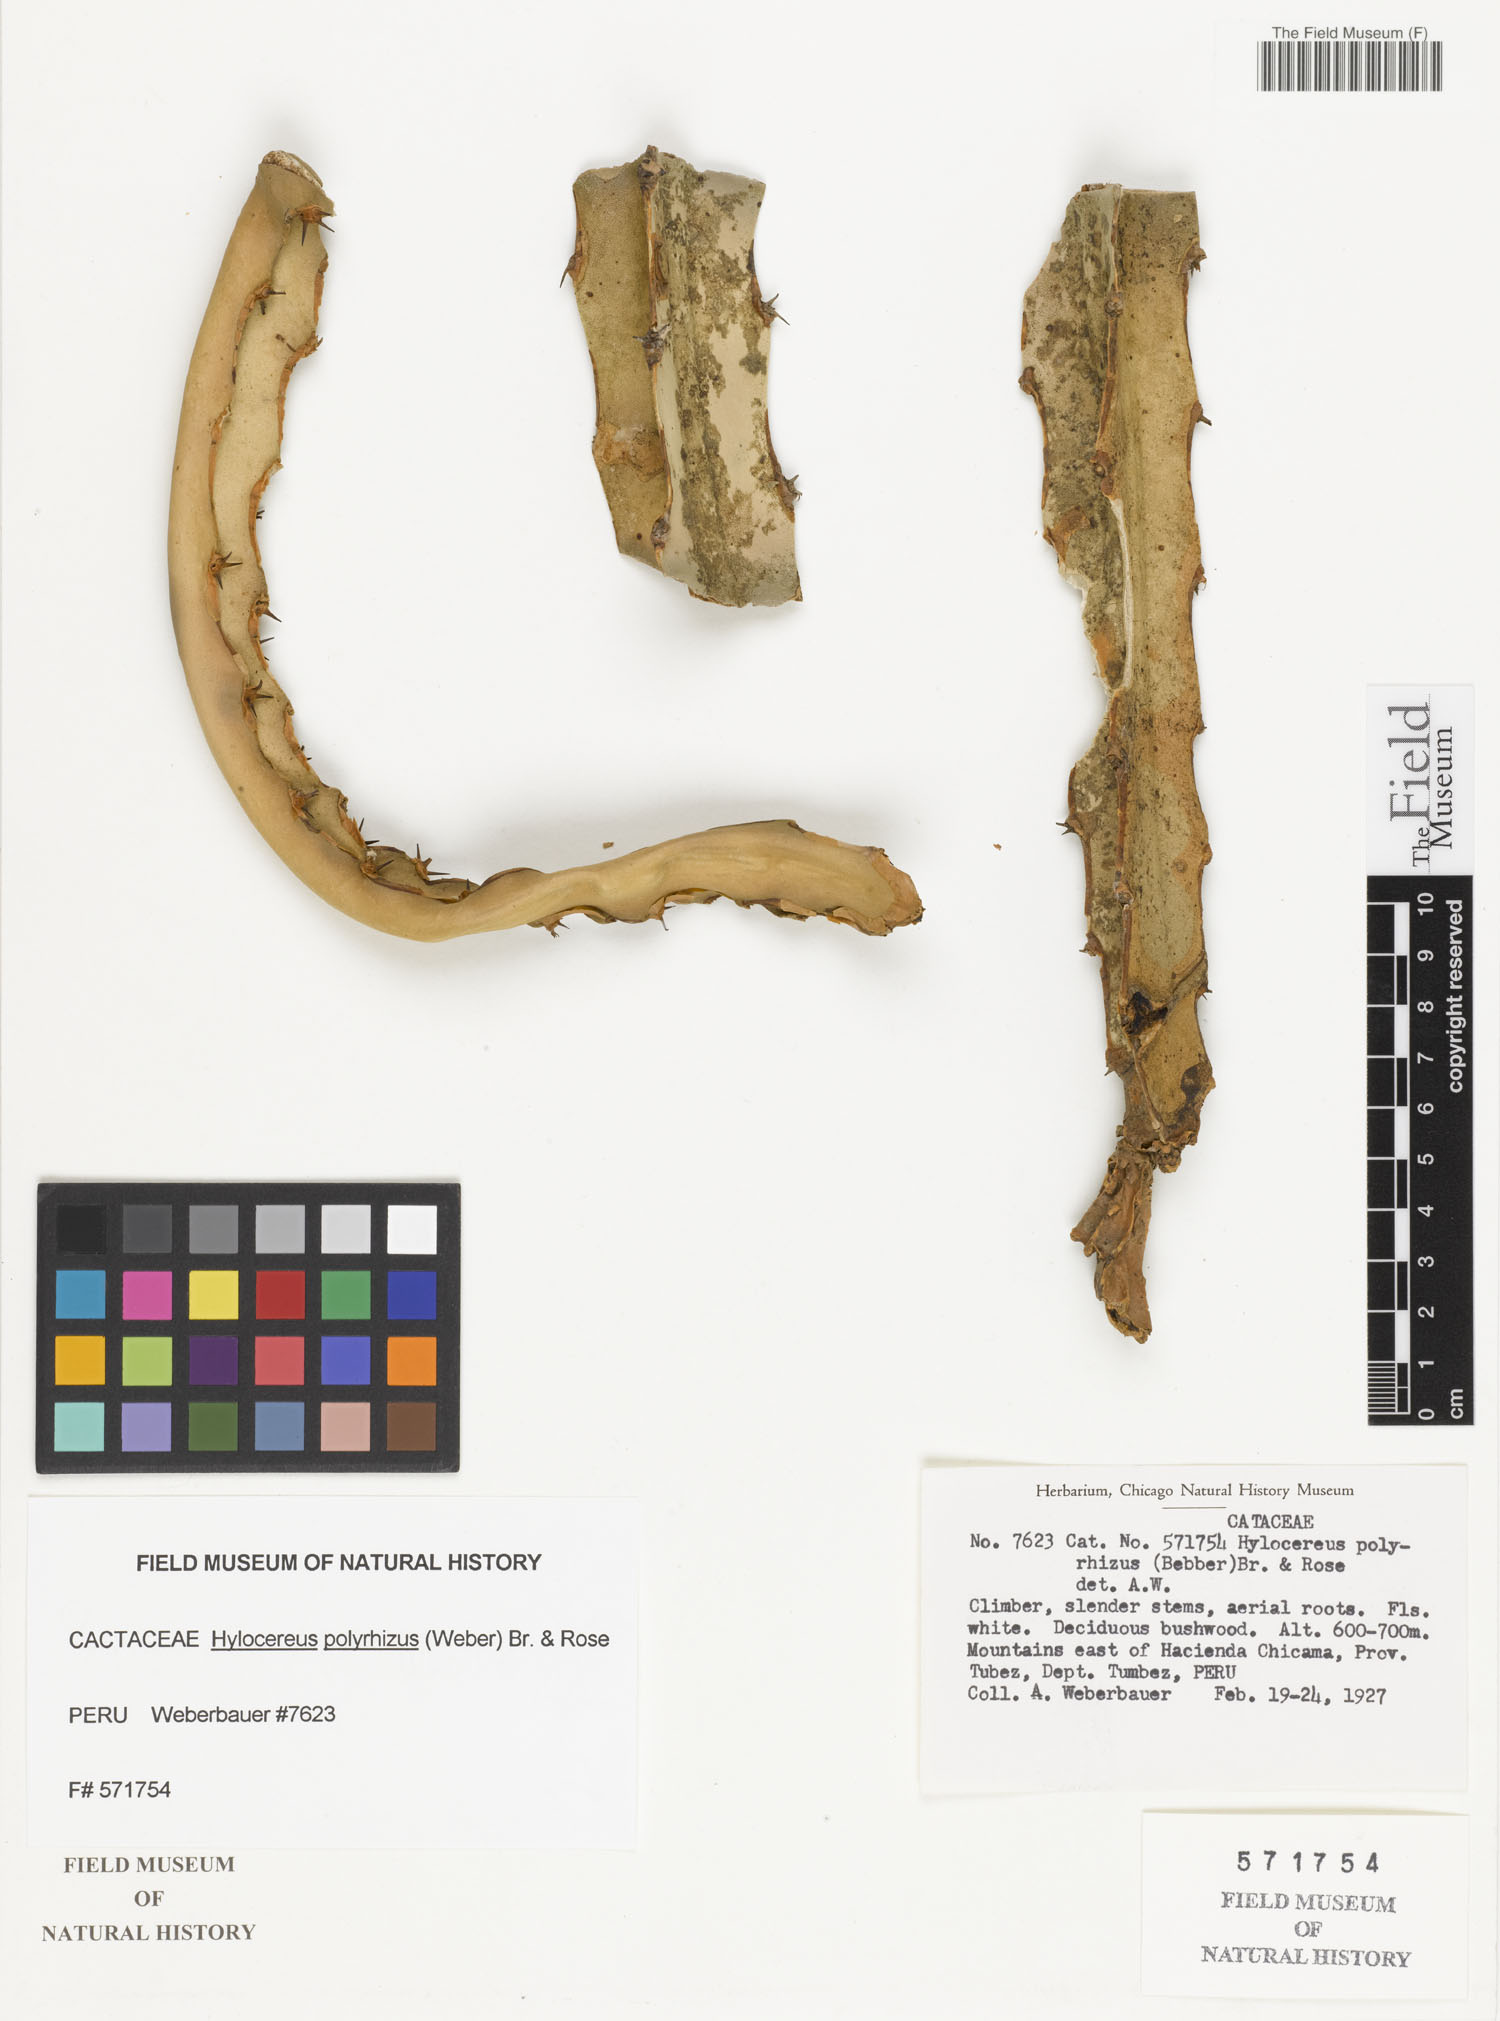 Hylocereus polyrhizus image